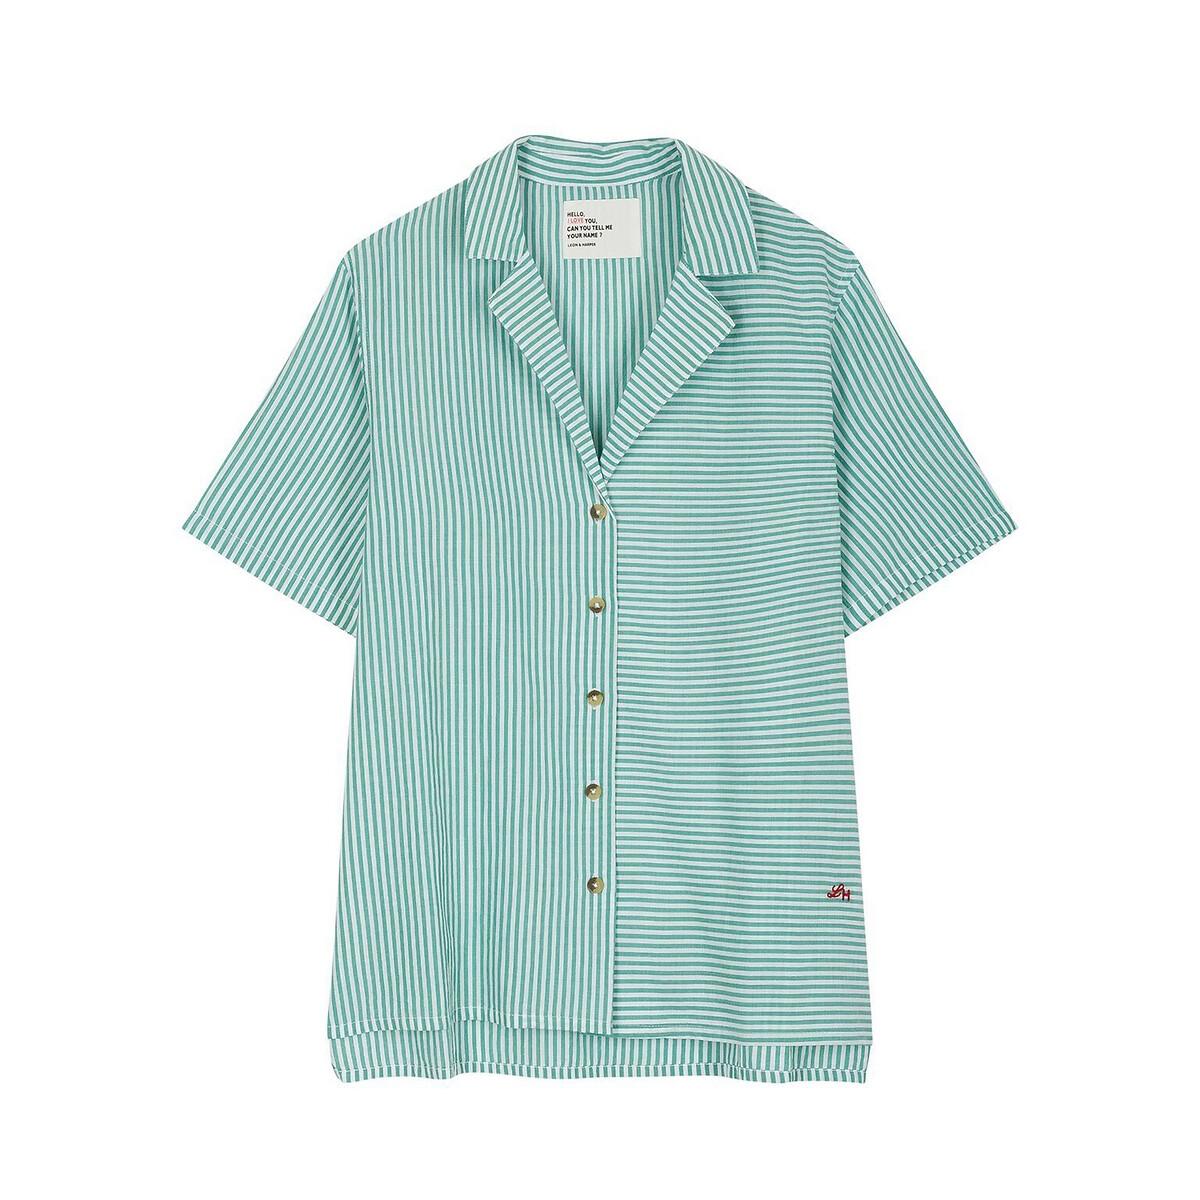 Рубашка La Redoute Из биохлопка с короткими рукавами CARAIBE M зеленый цена 2017